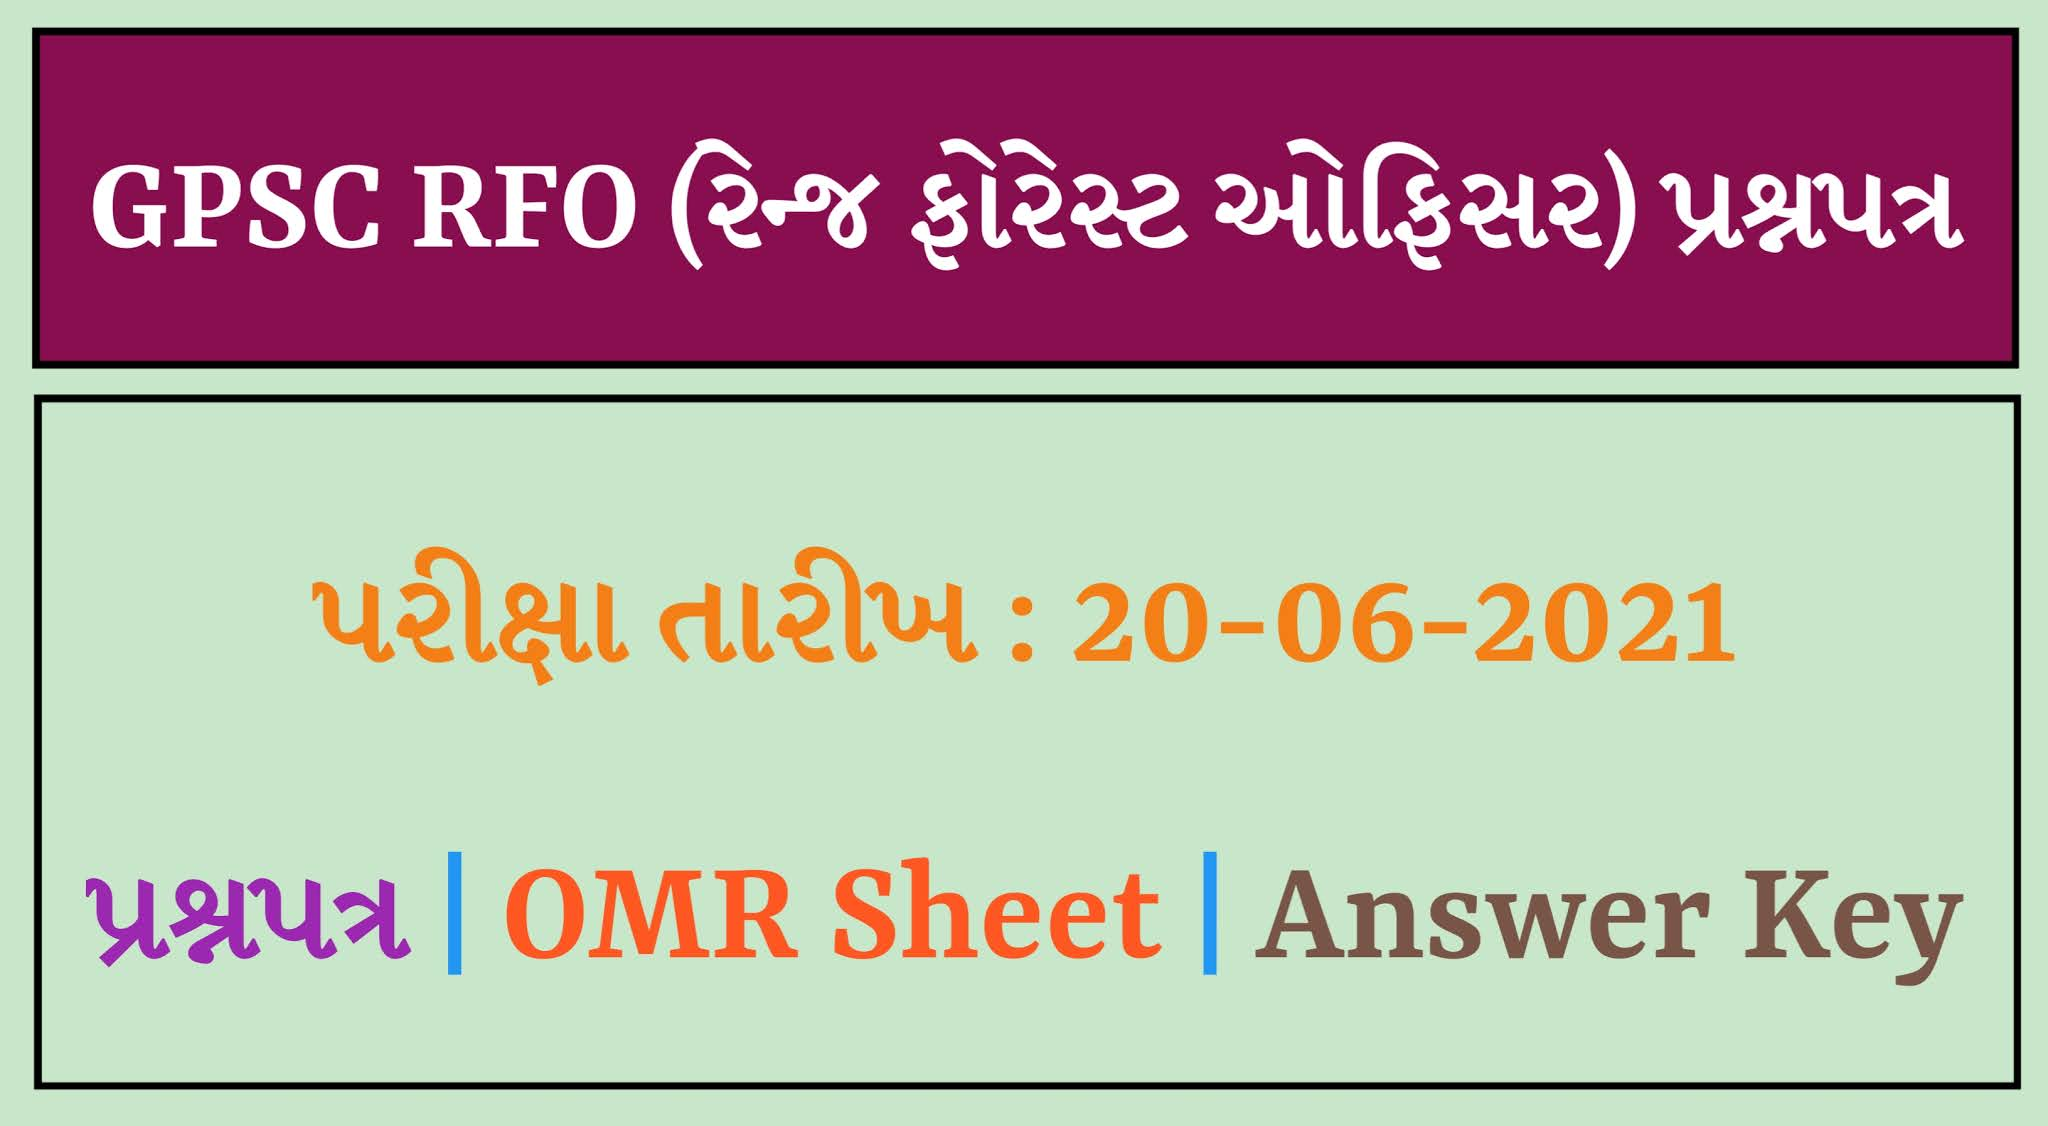 GPSC RFO Question Paper 2021 | GPSC RFO Answer Key 2021 | GPSC RFO OMR Sheet 2021 | Advt. No : 24/2020-21 | RFO Answer Key 2021 | RFO Question Paper 2021 | RFO Paper Solution 2021 | GPSC RFO Answer Key | GPSC RFO Exam Paper 2021 | RFO Paper GPSC 2021 | RFO Exam Paper 2021 | GPSC RFO OMR Sheet | GPSC RFO Paper 2021 | RFO Paper 2021 Gujarat | RFO 2021 Answer Key